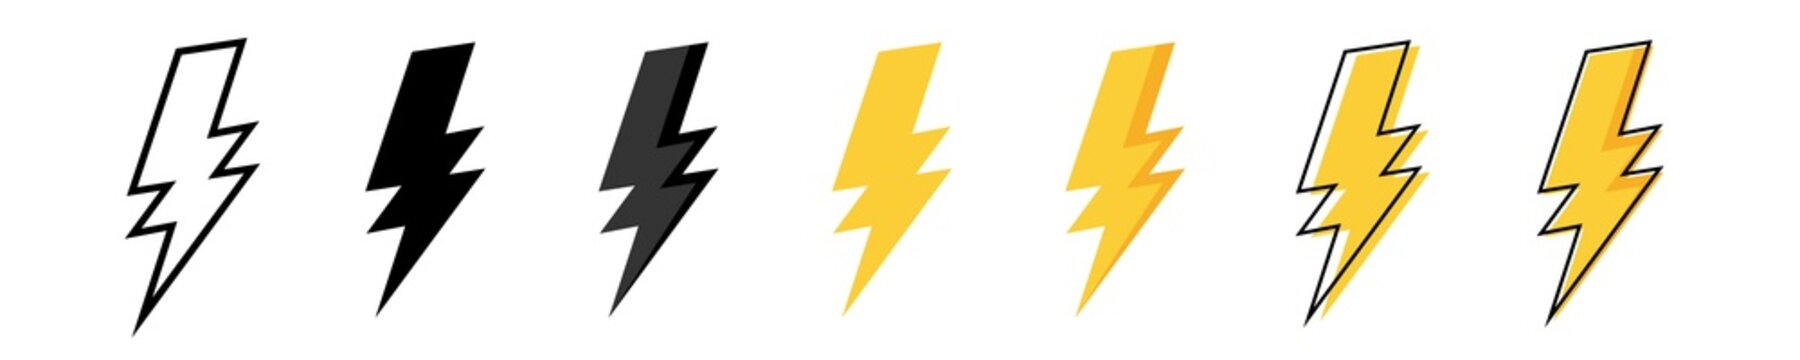 Thunder bolt vector icon. Flash logo set. Lightning icons on white background. Electrical sign. Thunderbolt symbol. Electric concept stock vector illustration.